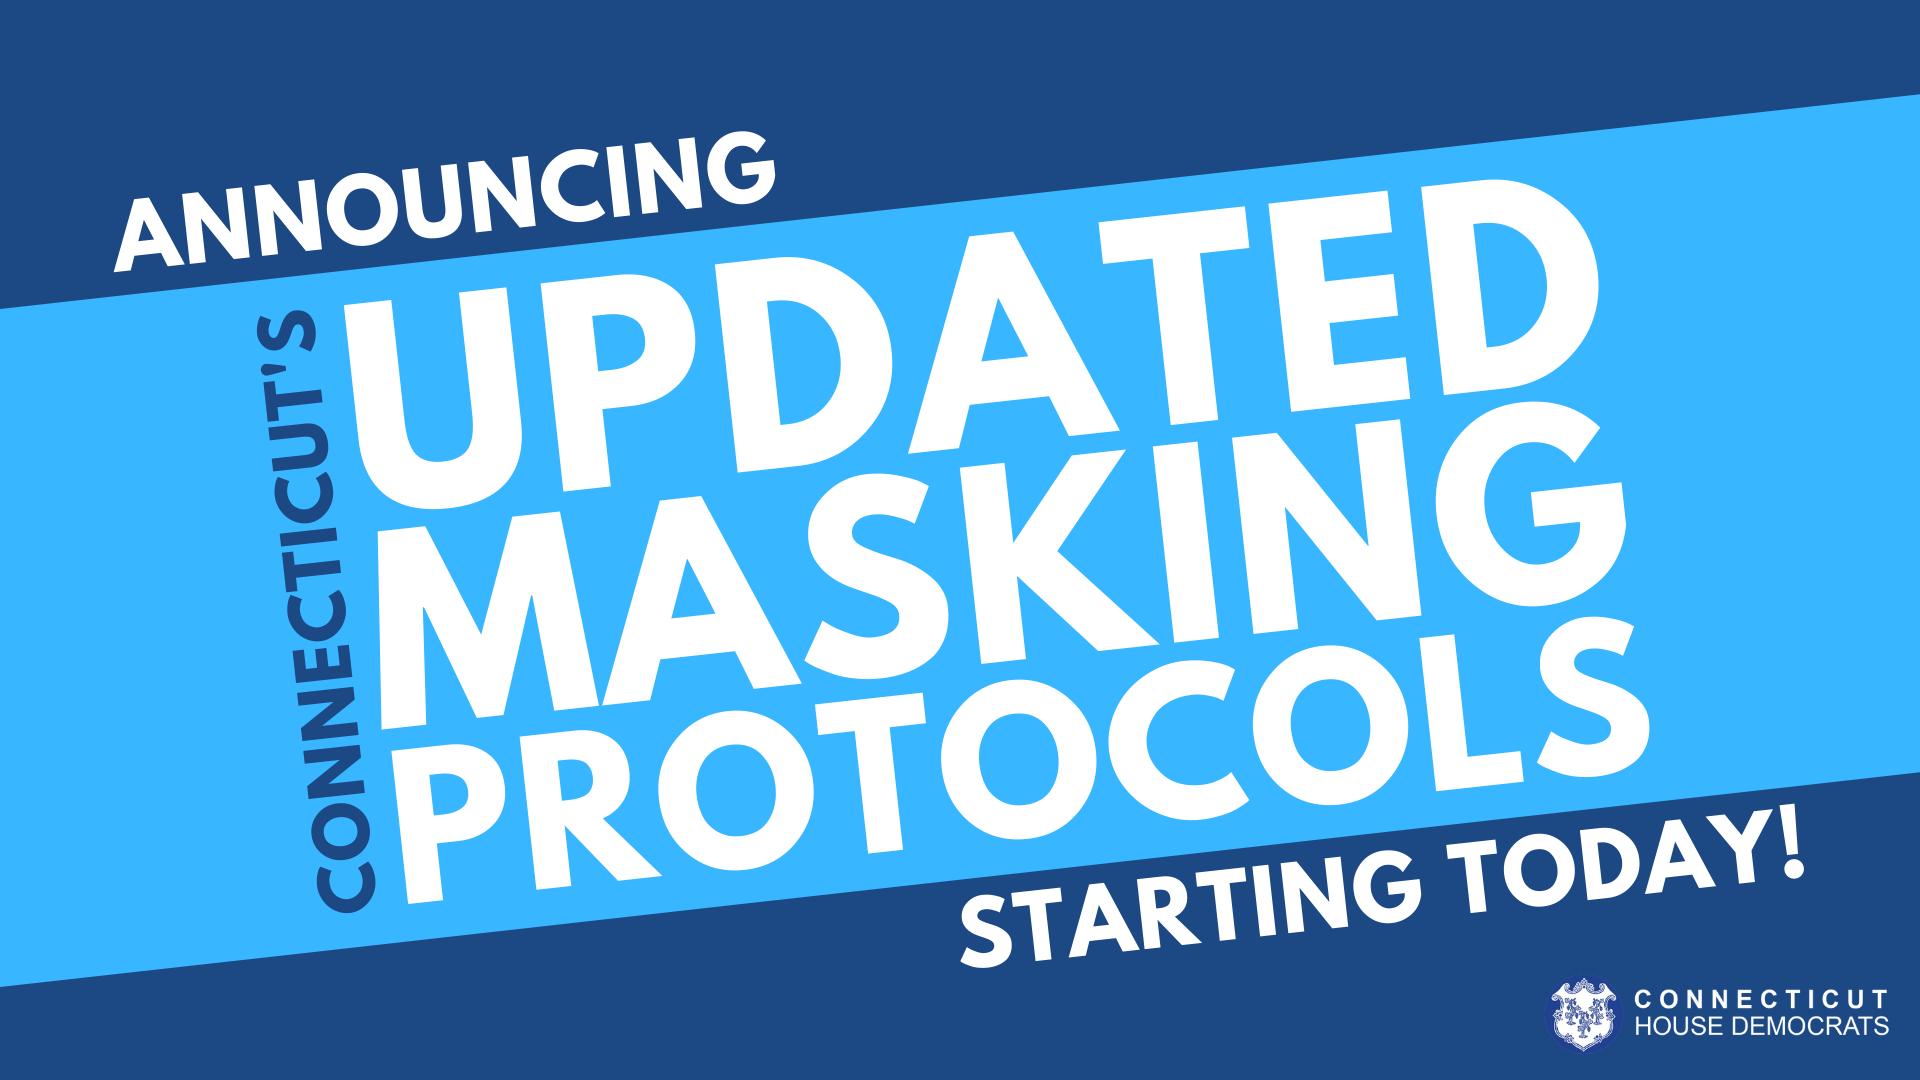 Paris New Mask Protocols Effective Today